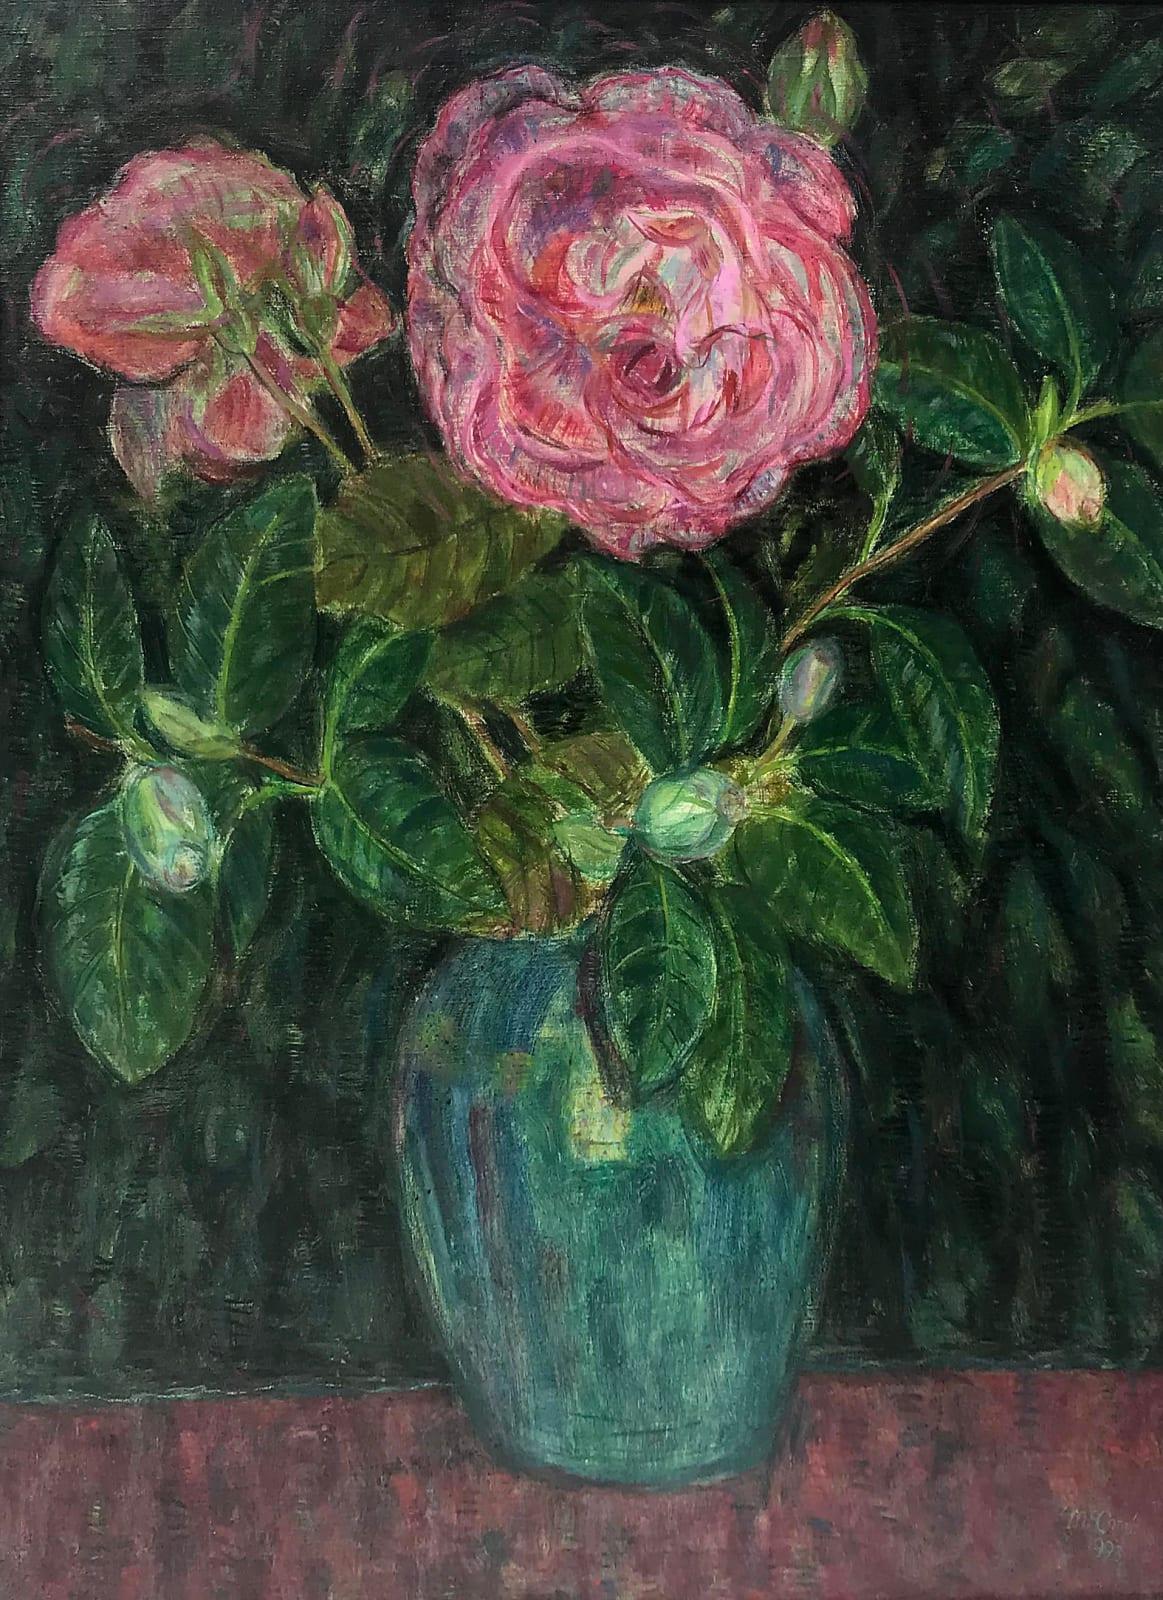 Leonard Mccomb, Christmas Roses, 1993